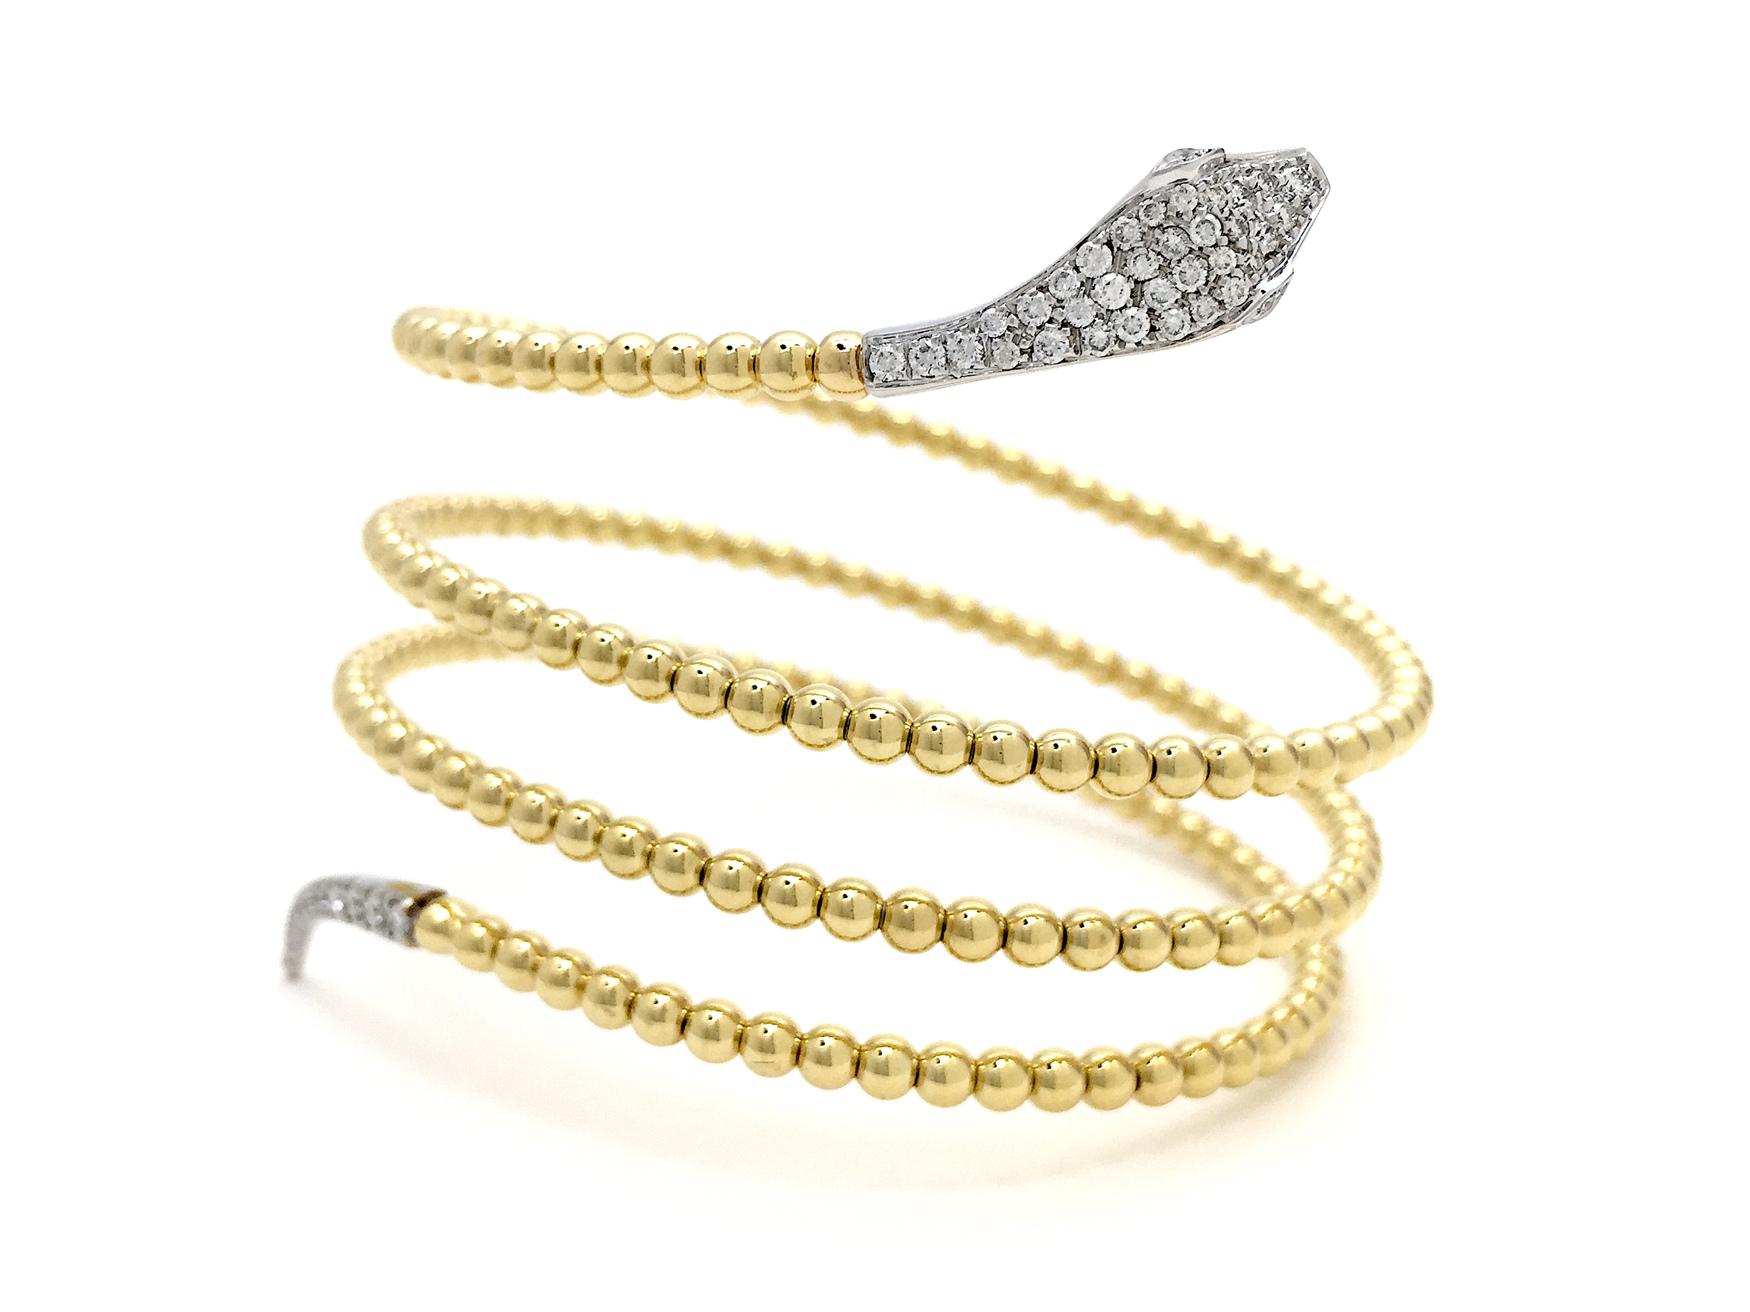 Sensi joyas jewellery Granada silver engagementDIAMONDS  BRACELET